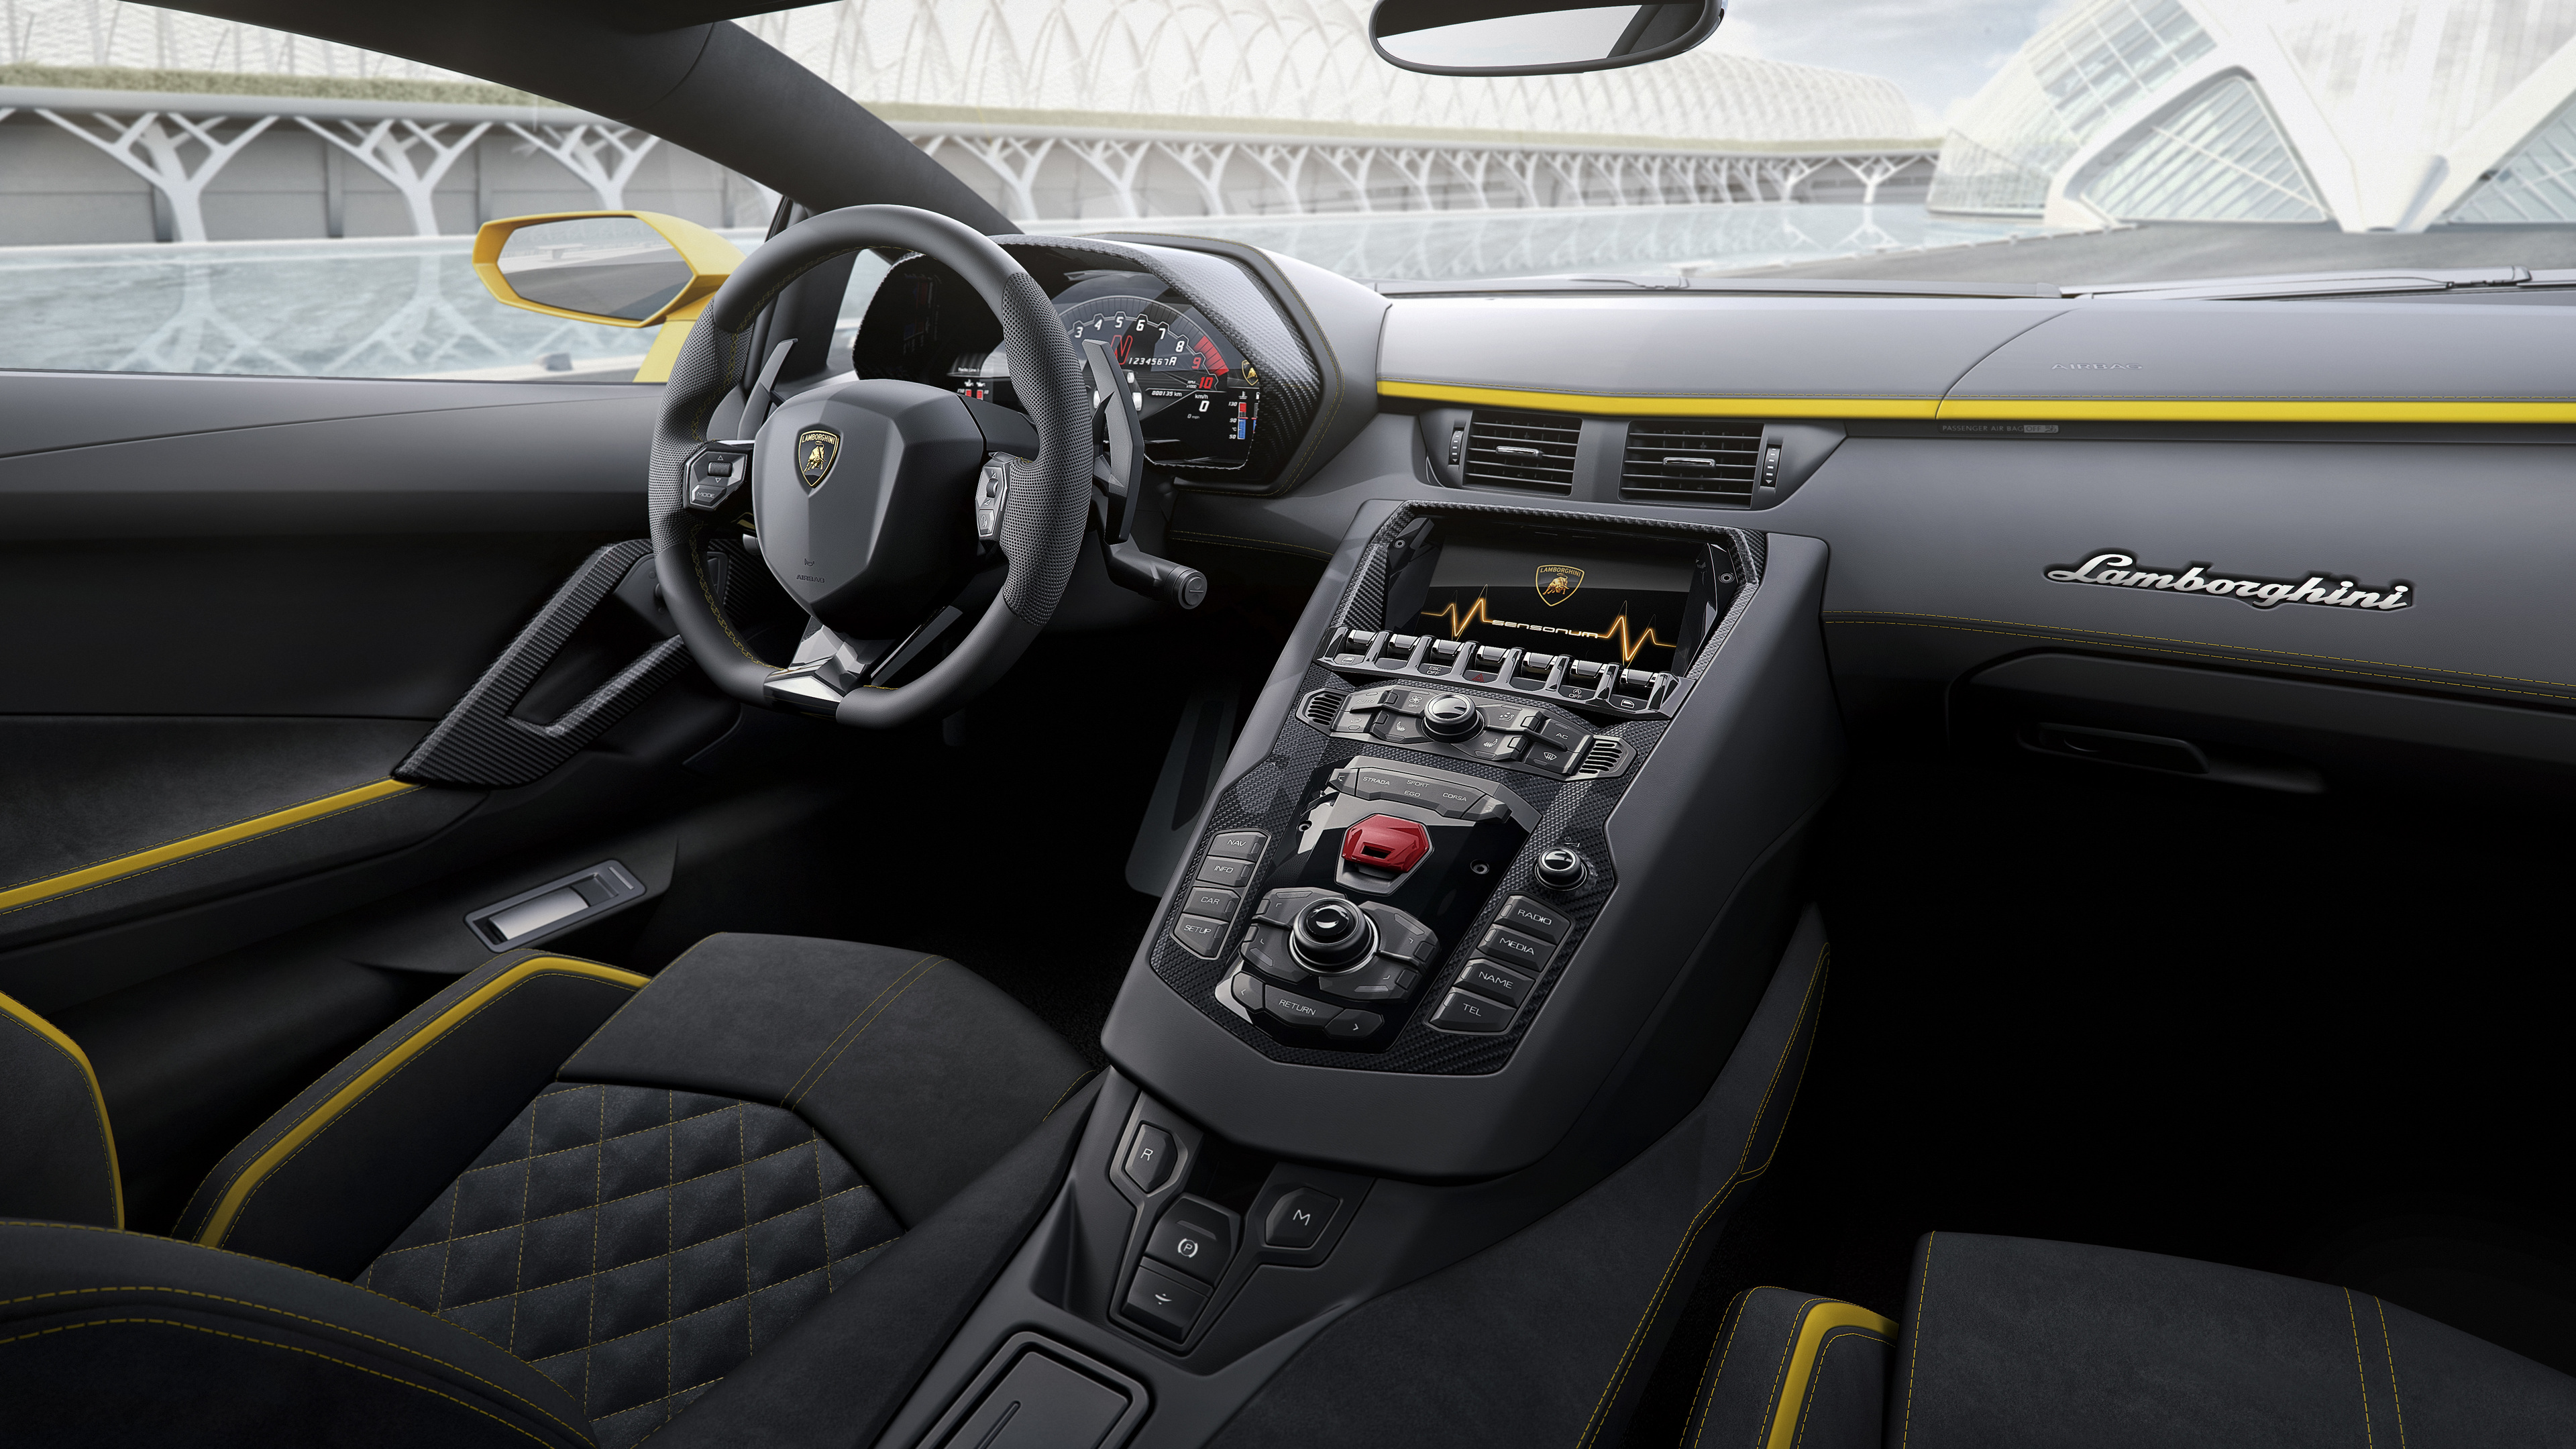 2017 lamborghini aventador s interior 8k 1539104869 - 2017 Lamborghini Aventador S Interior 8k - lamborghini wallpapers, lamborghini aventador wallpapers, lamborghini aventador s wallpapers, cars wallpapers, 8k wallpapers, 2017 cars wallpapers